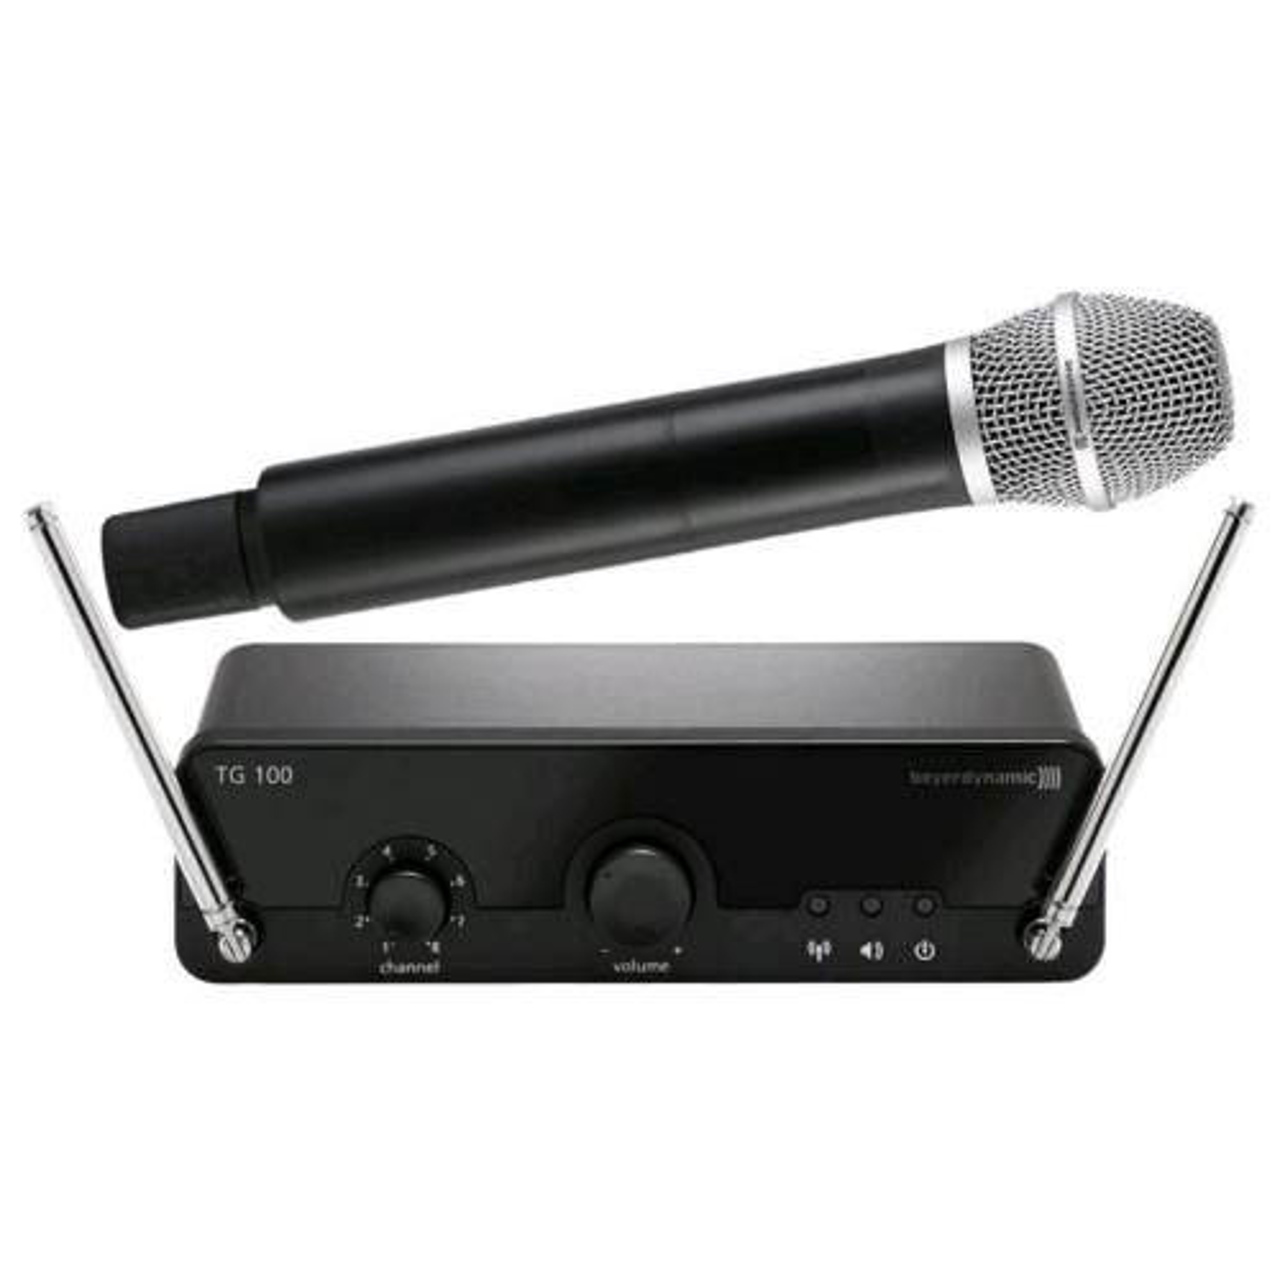 میکروفون بیسیم بیرداینامیک مدل TG 100 H